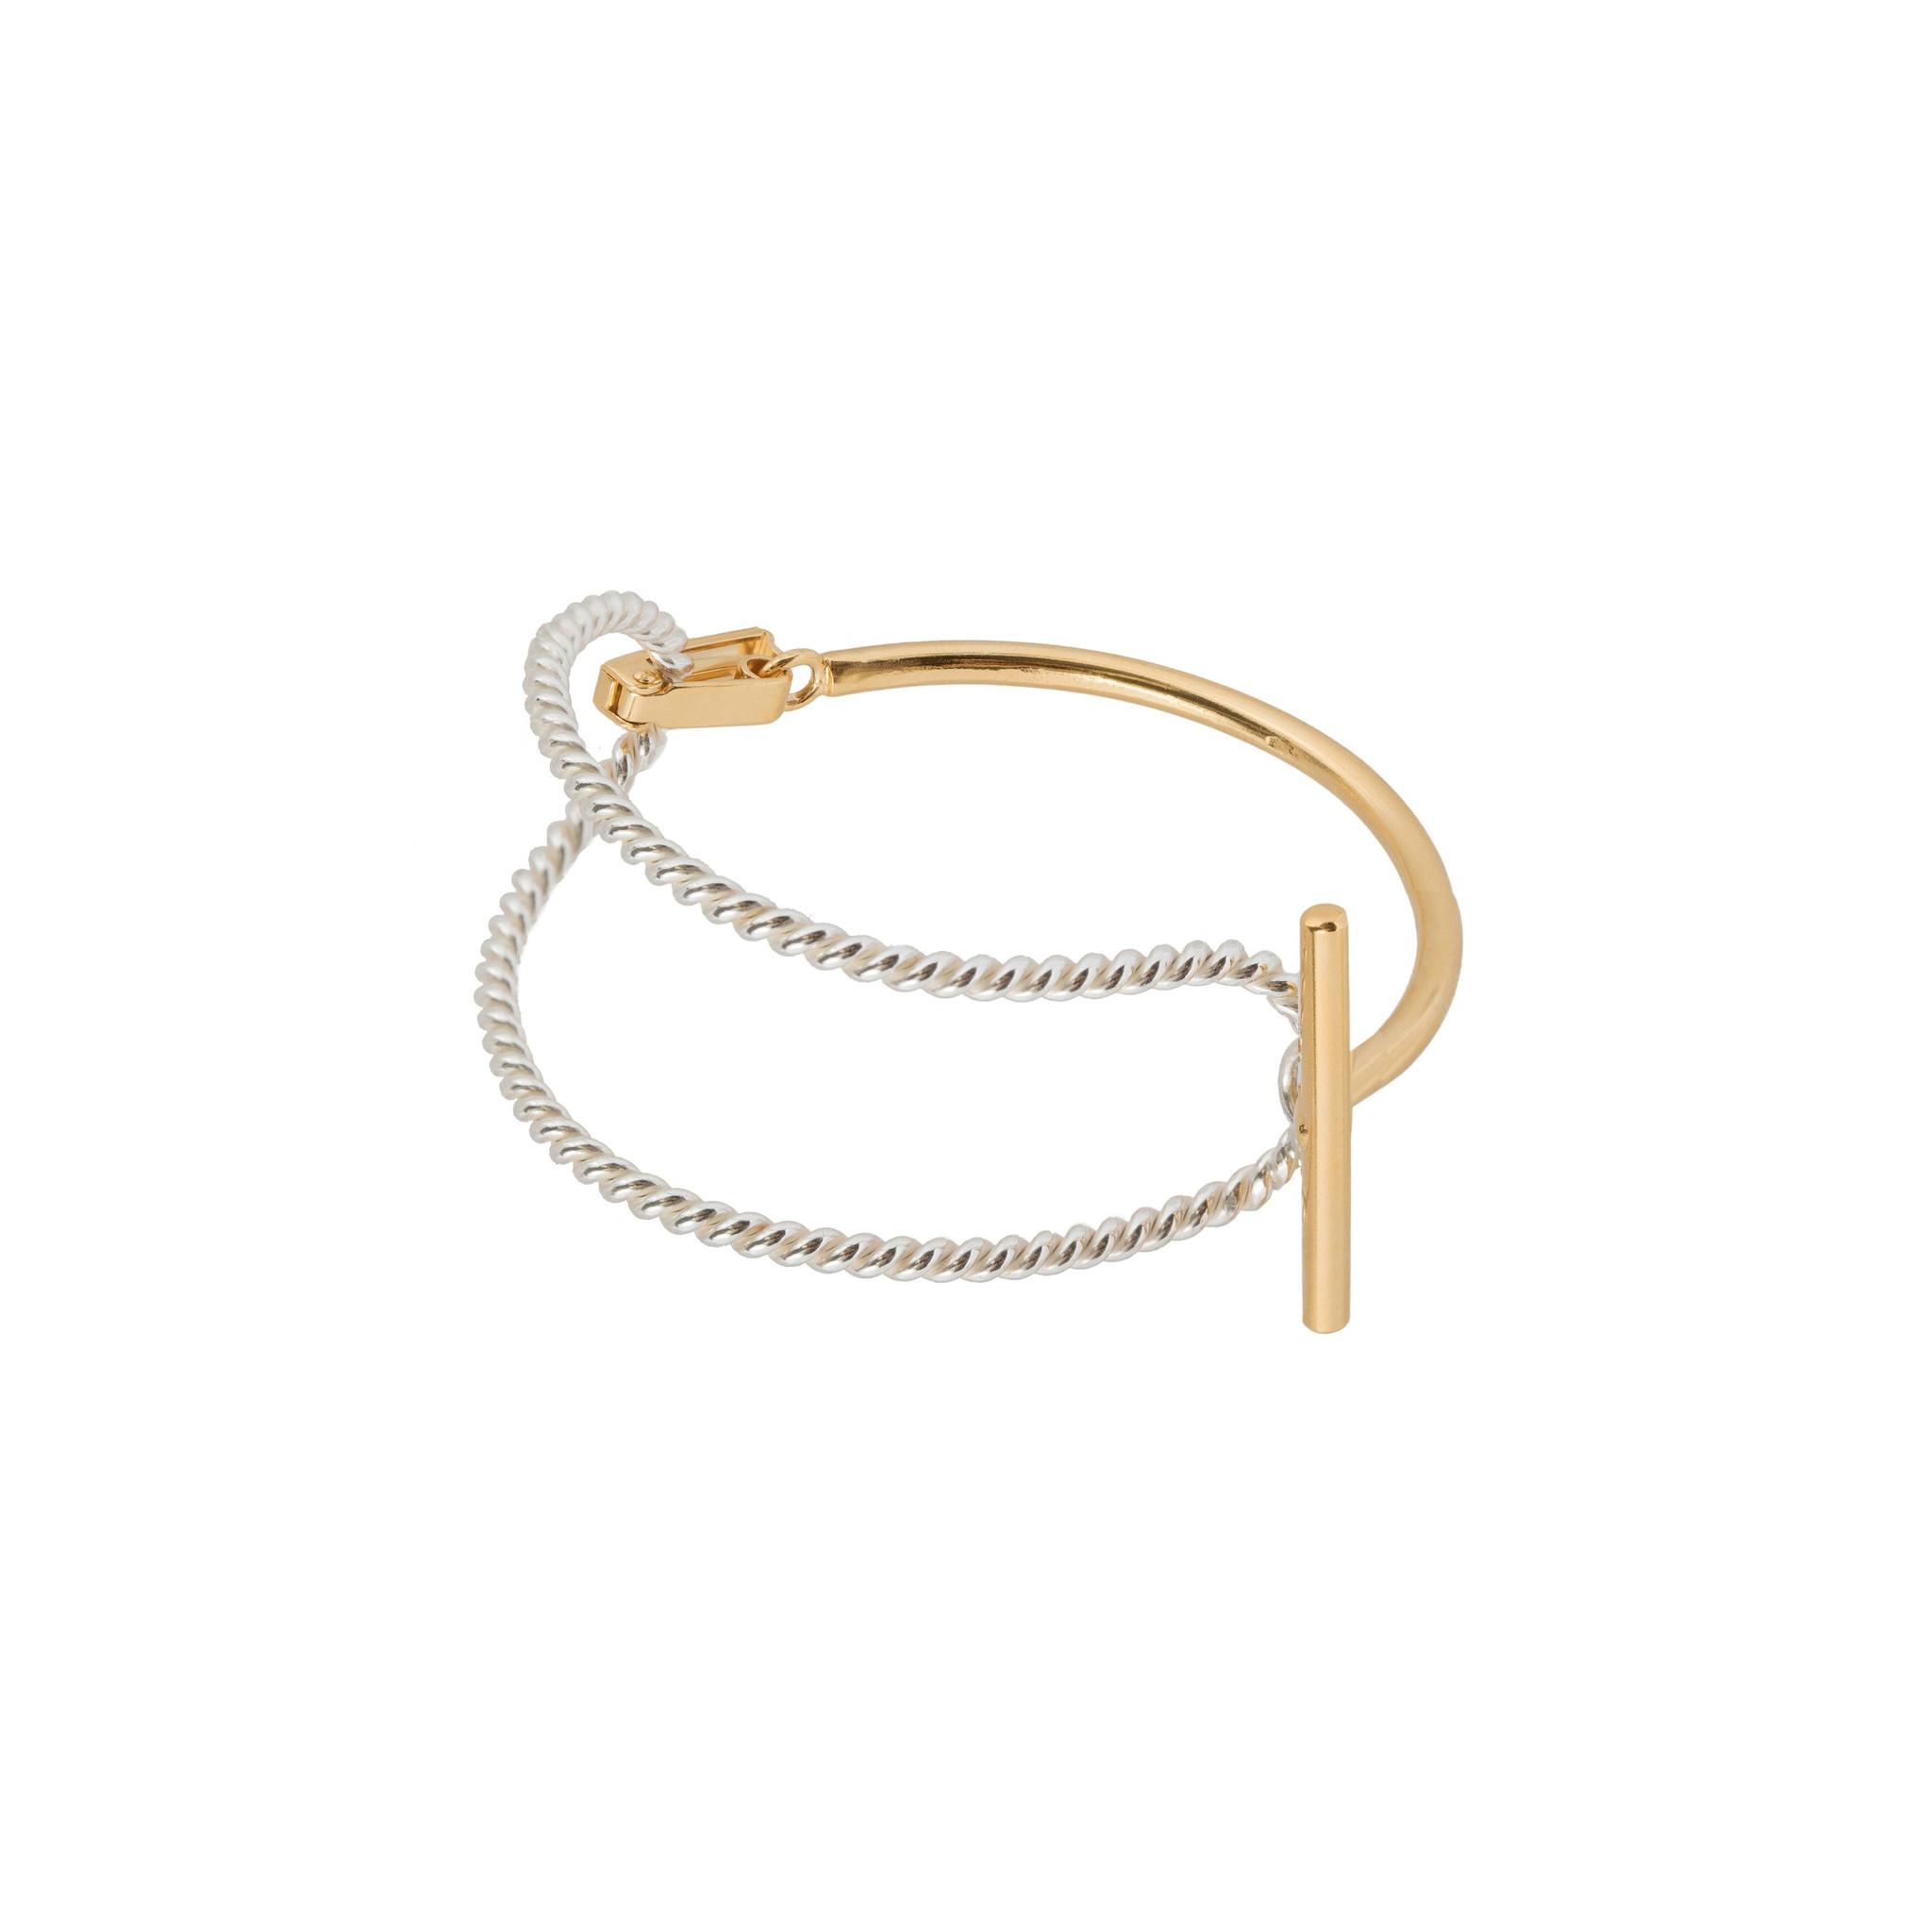 Statement bracelet with t-clasp